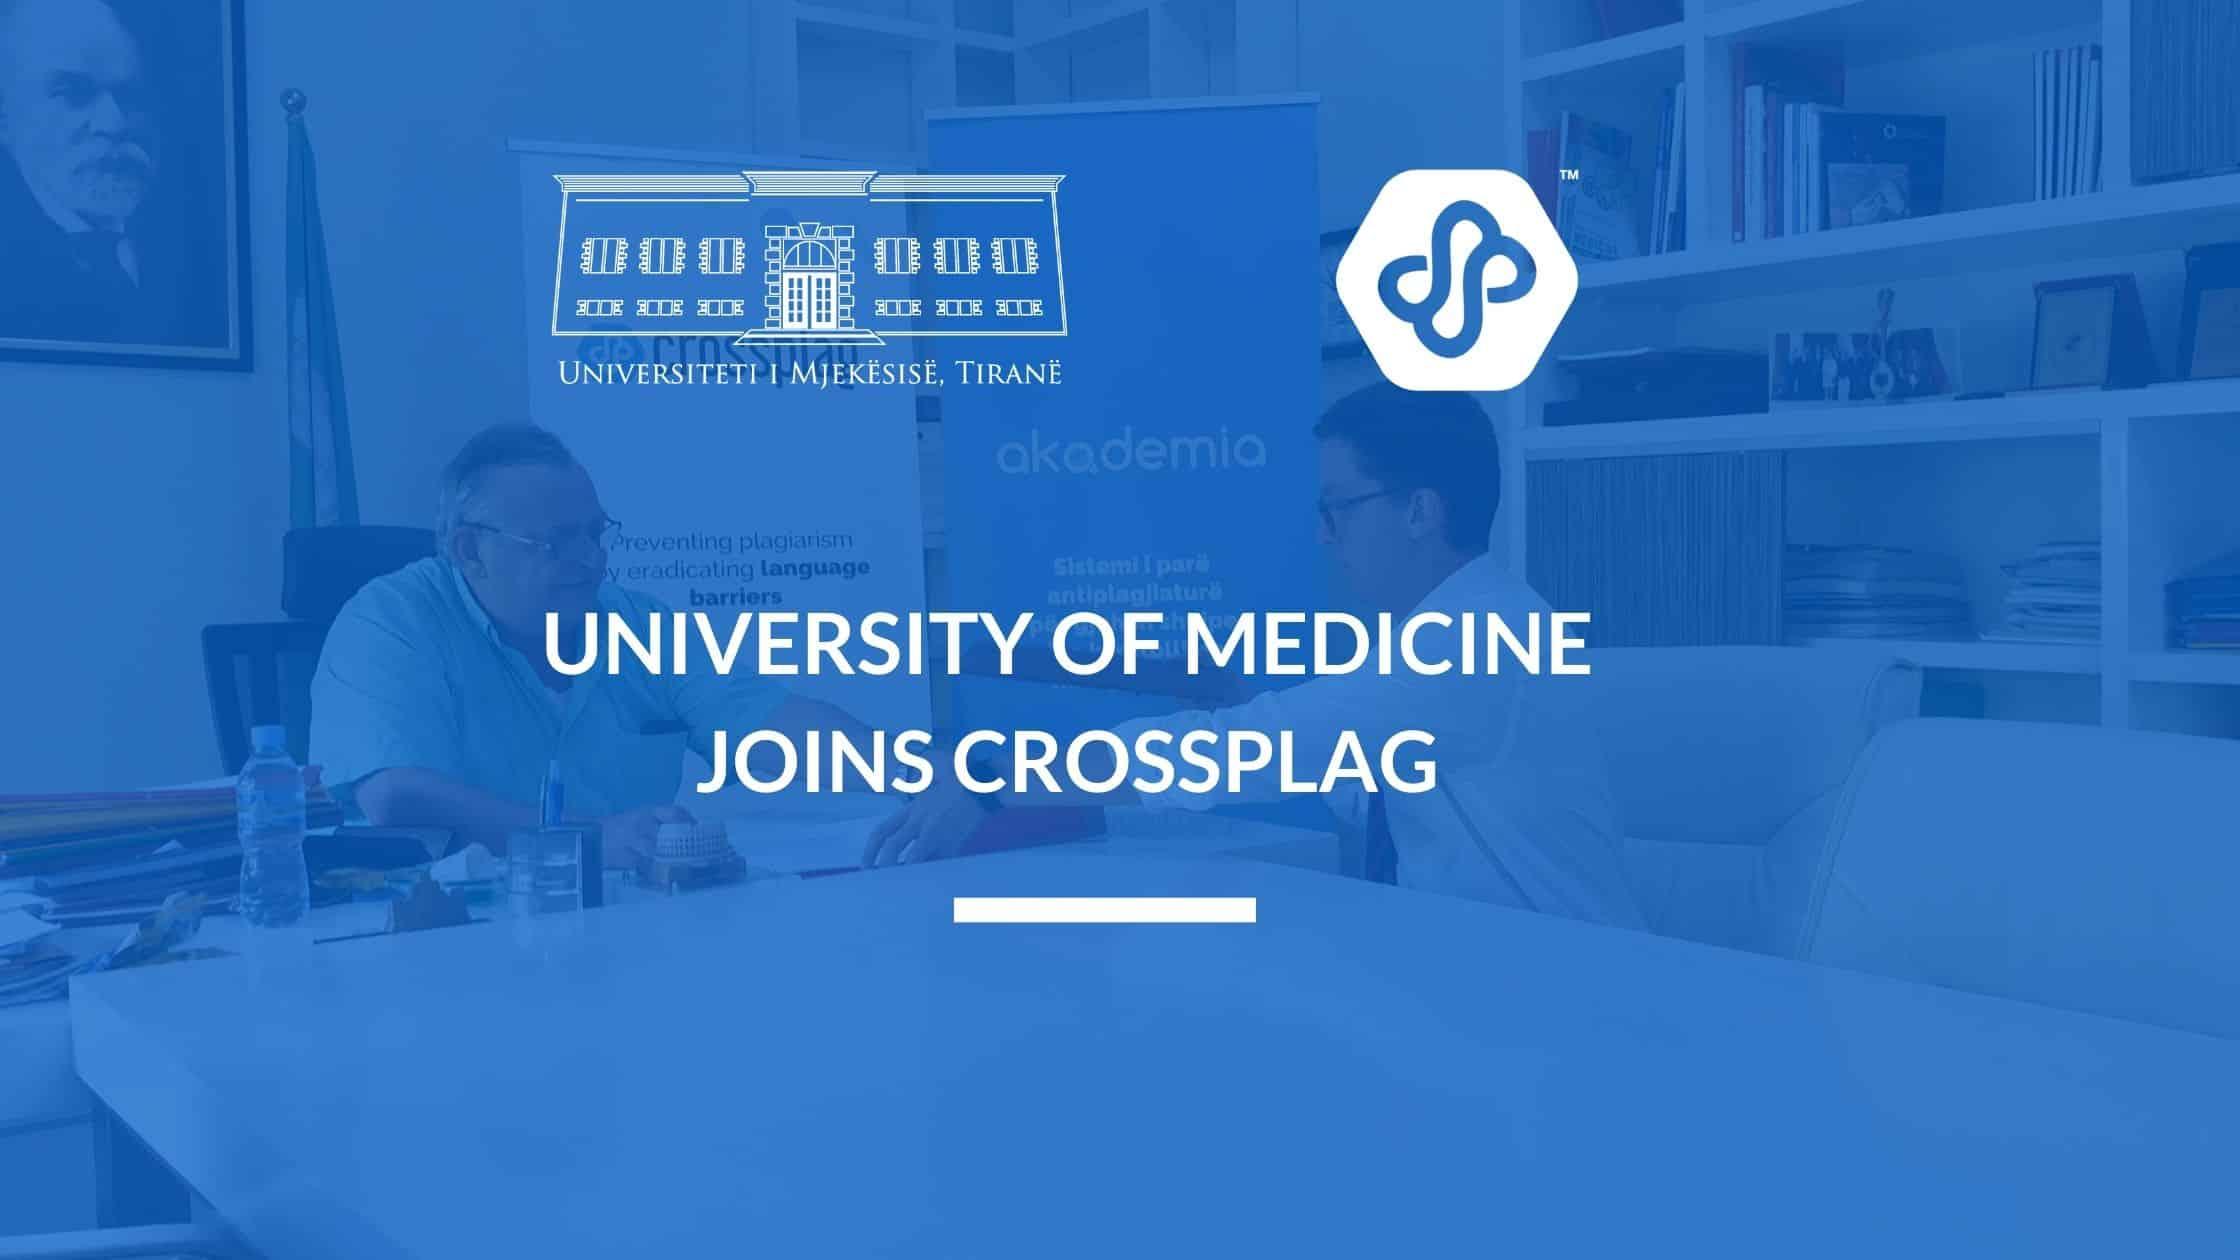 THE UNIVERSITY OF MEDICINE, TIRANA JOINS CROSSPLAG!